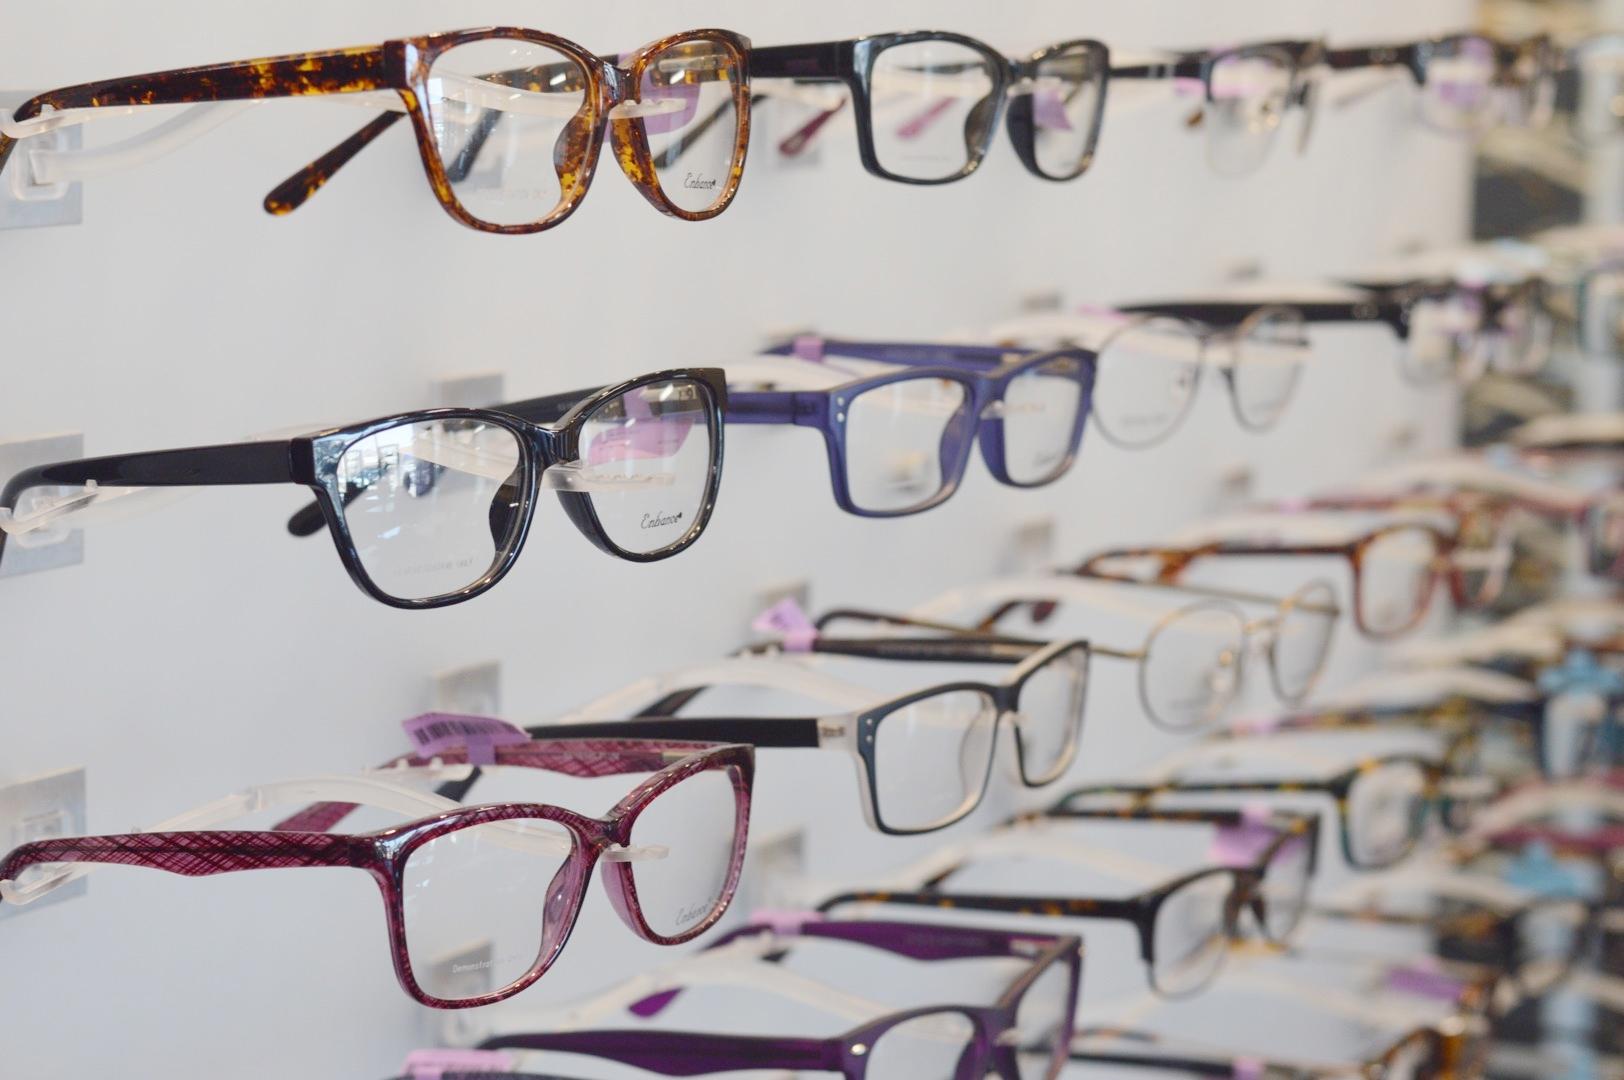 where to buy stylish glasses